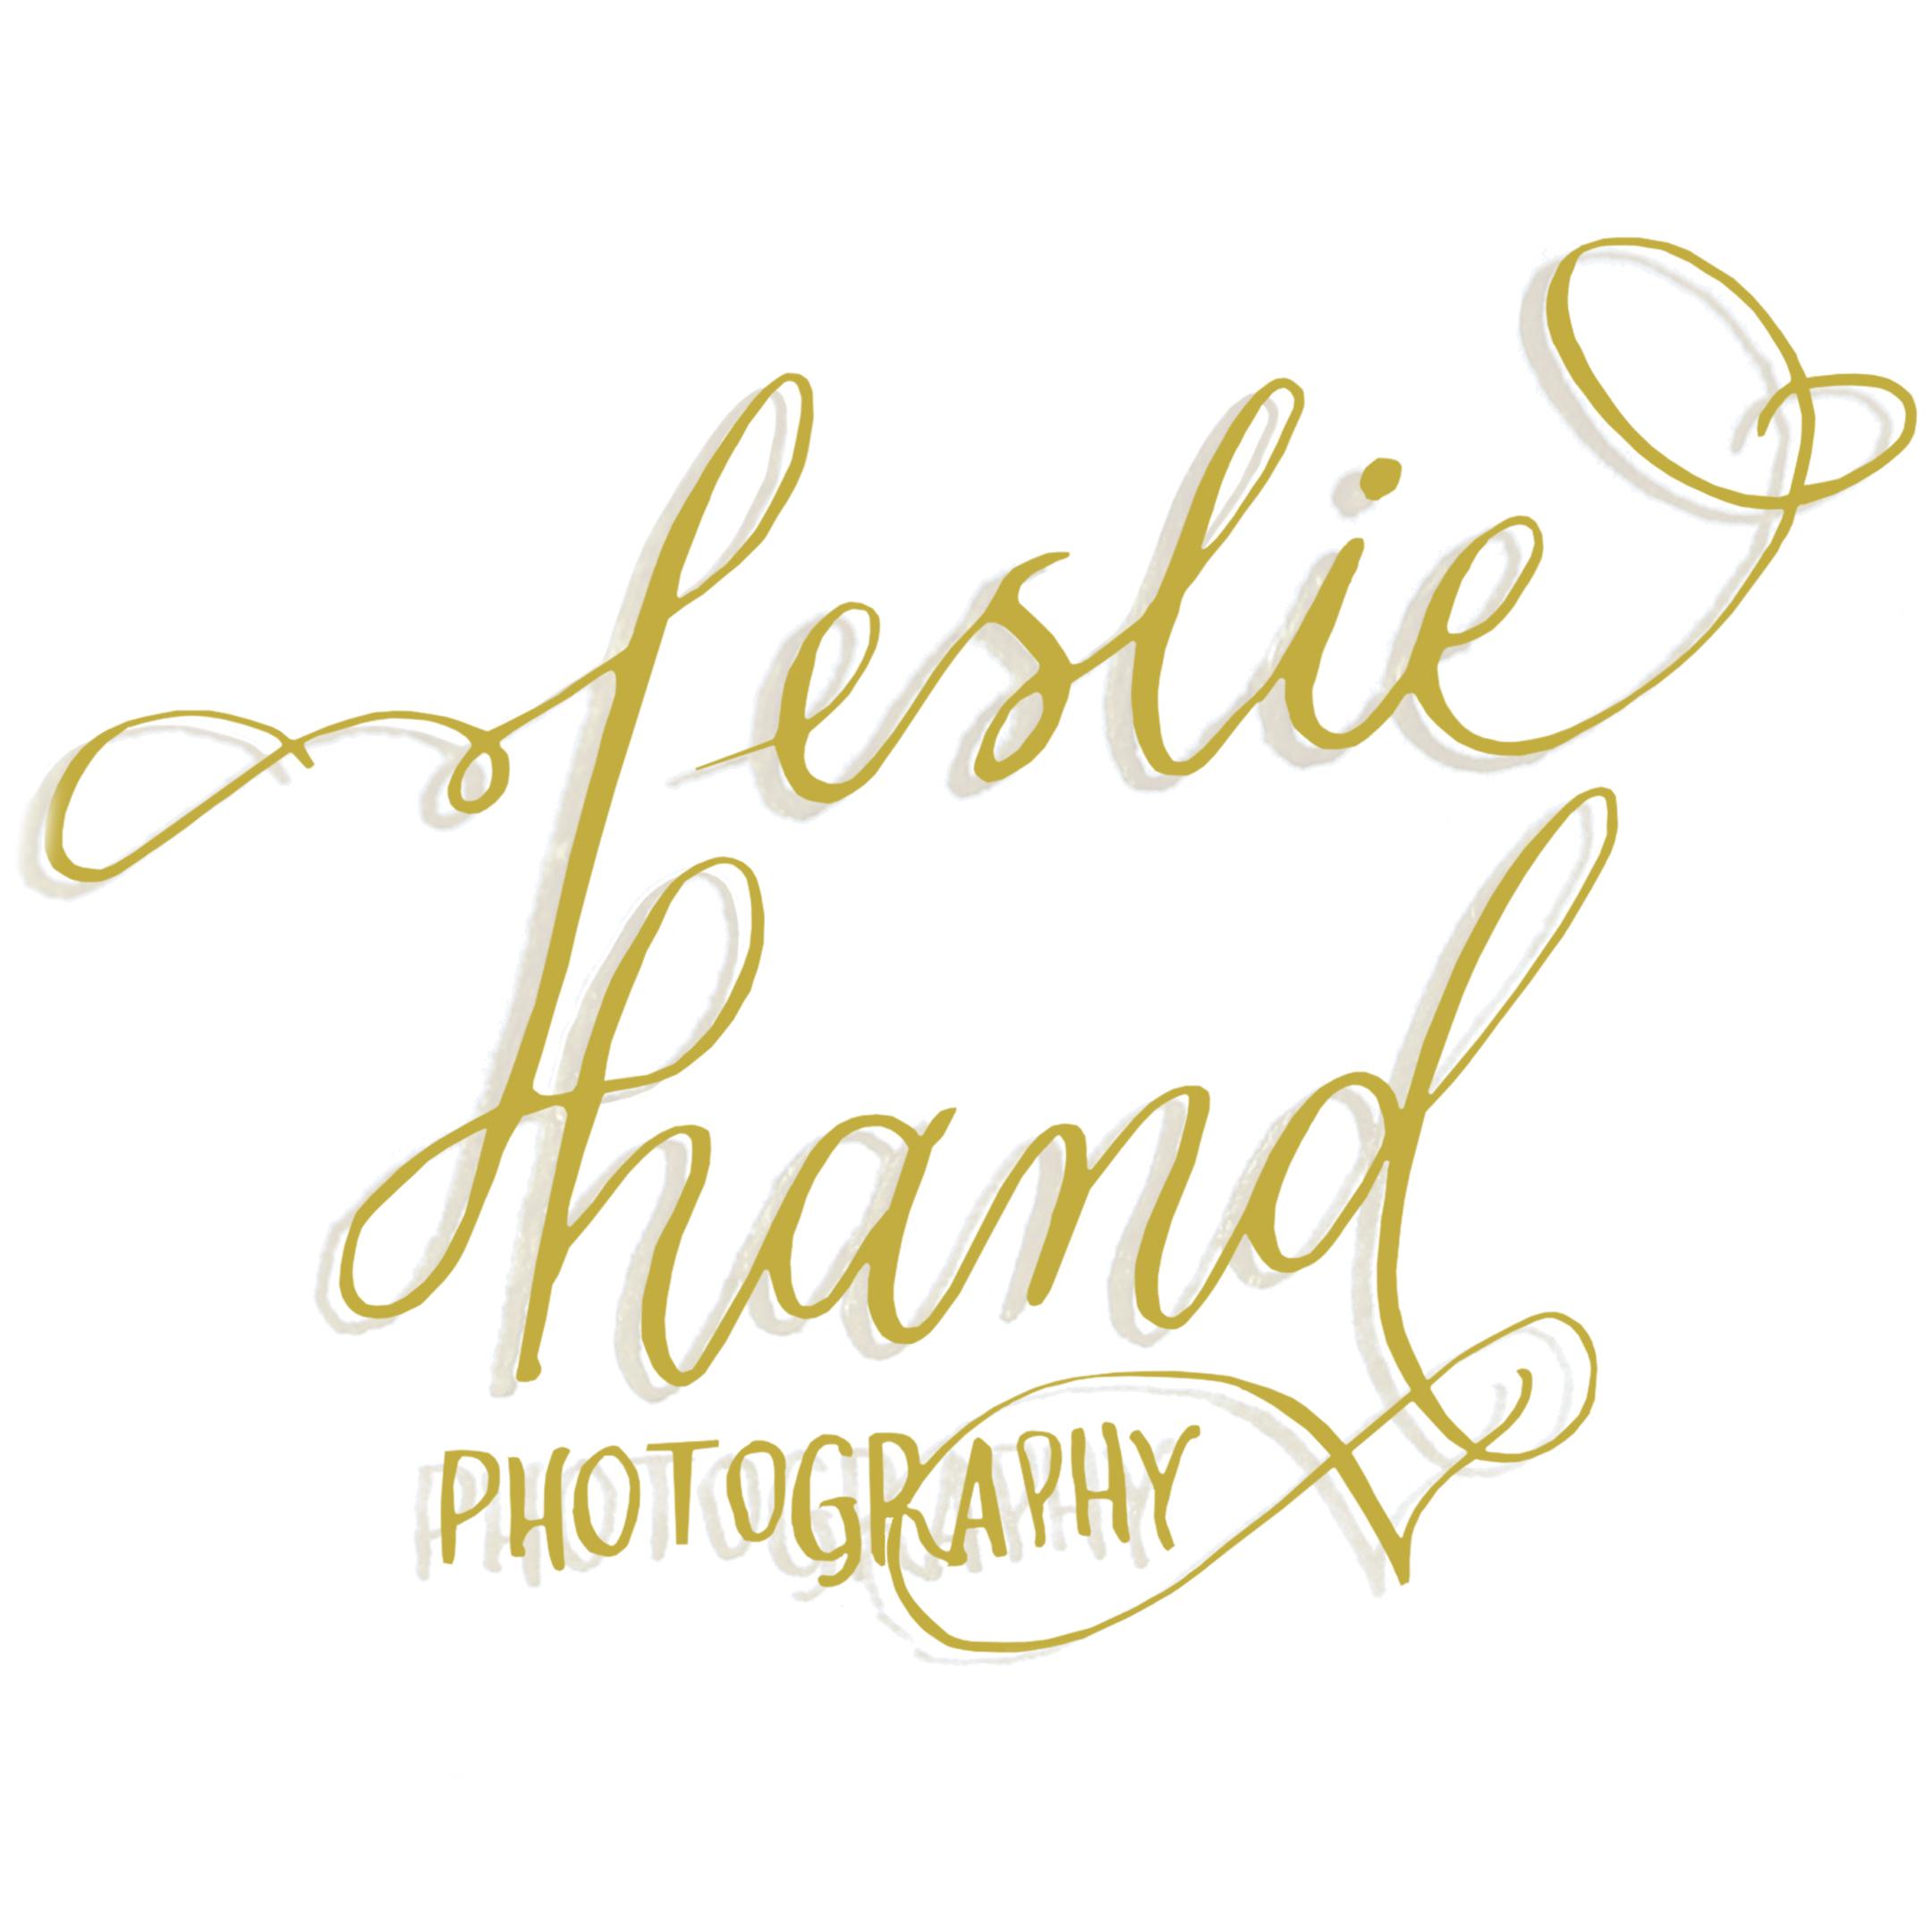 Leslie Hand Photography Logo